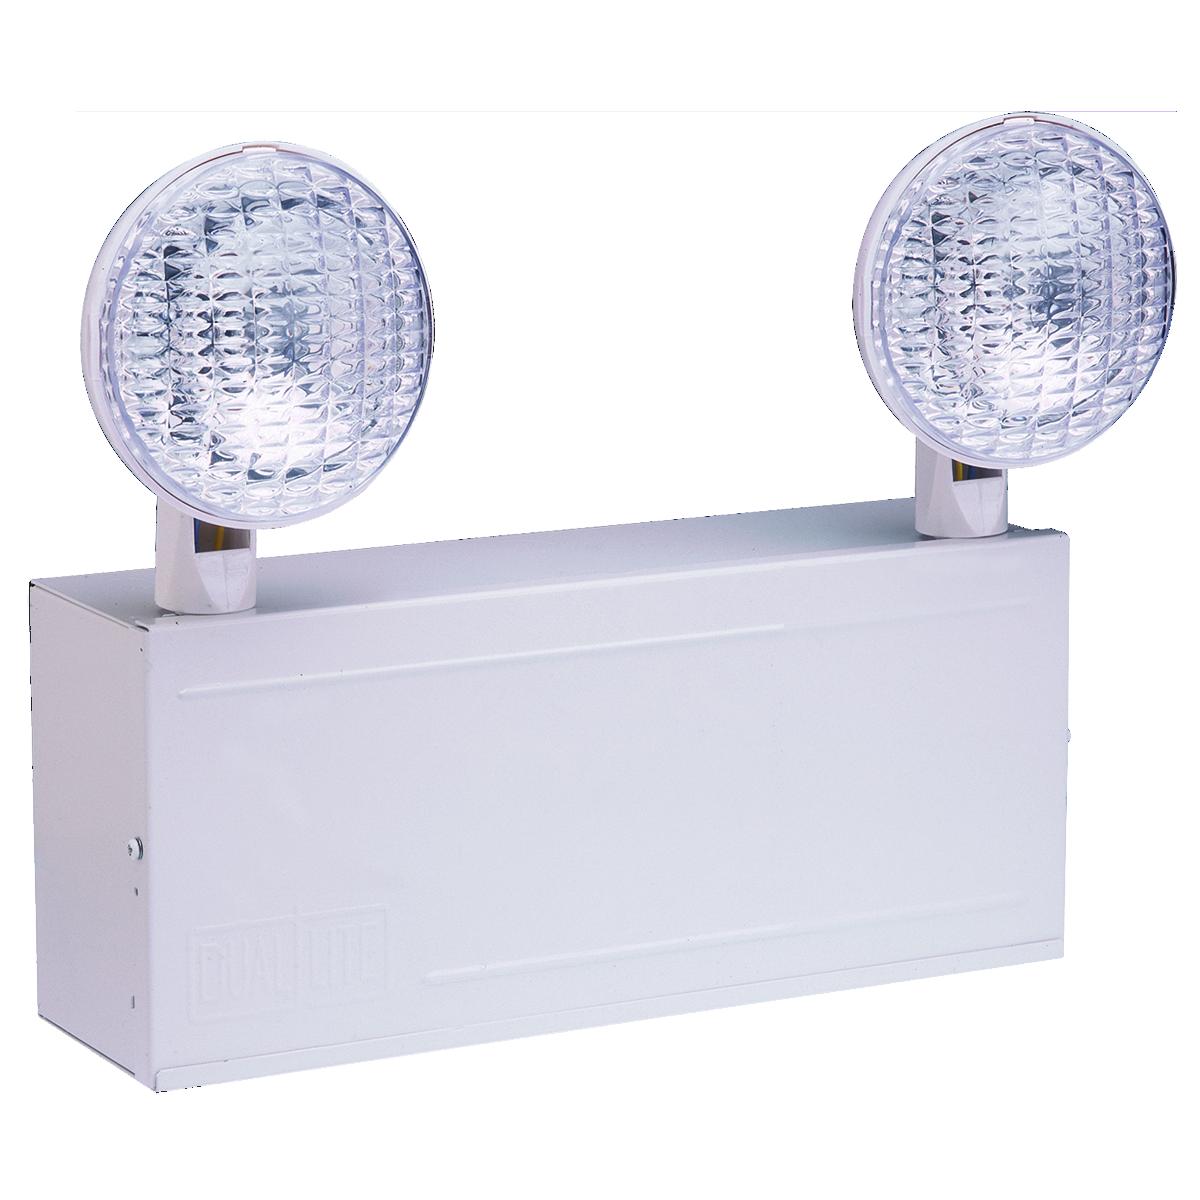 DUAL-LITE,LM2-03L,LIGHT EM HI CAPACITY 6V 10.8W WHT LED